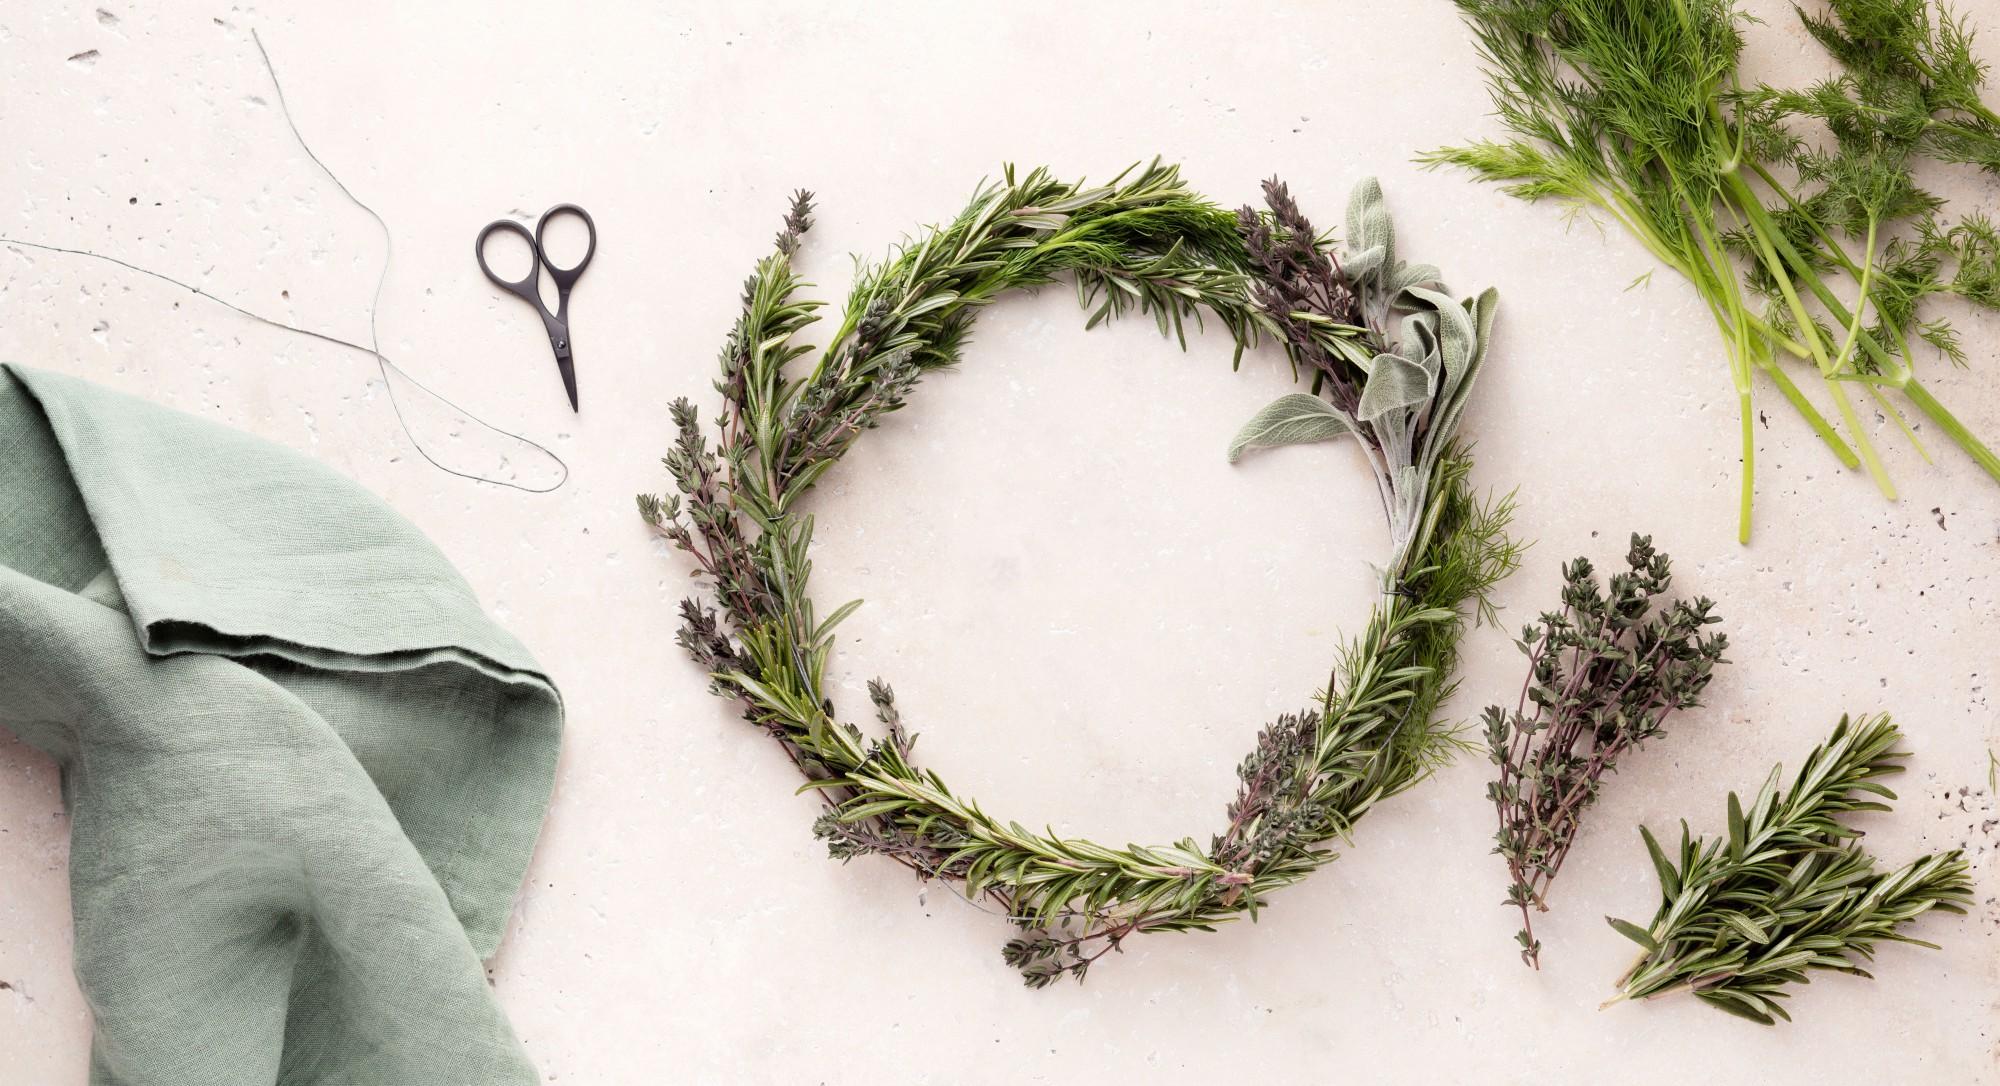 Tip of the Week: This DIY Herb Wreath Smells as Good as It Looks